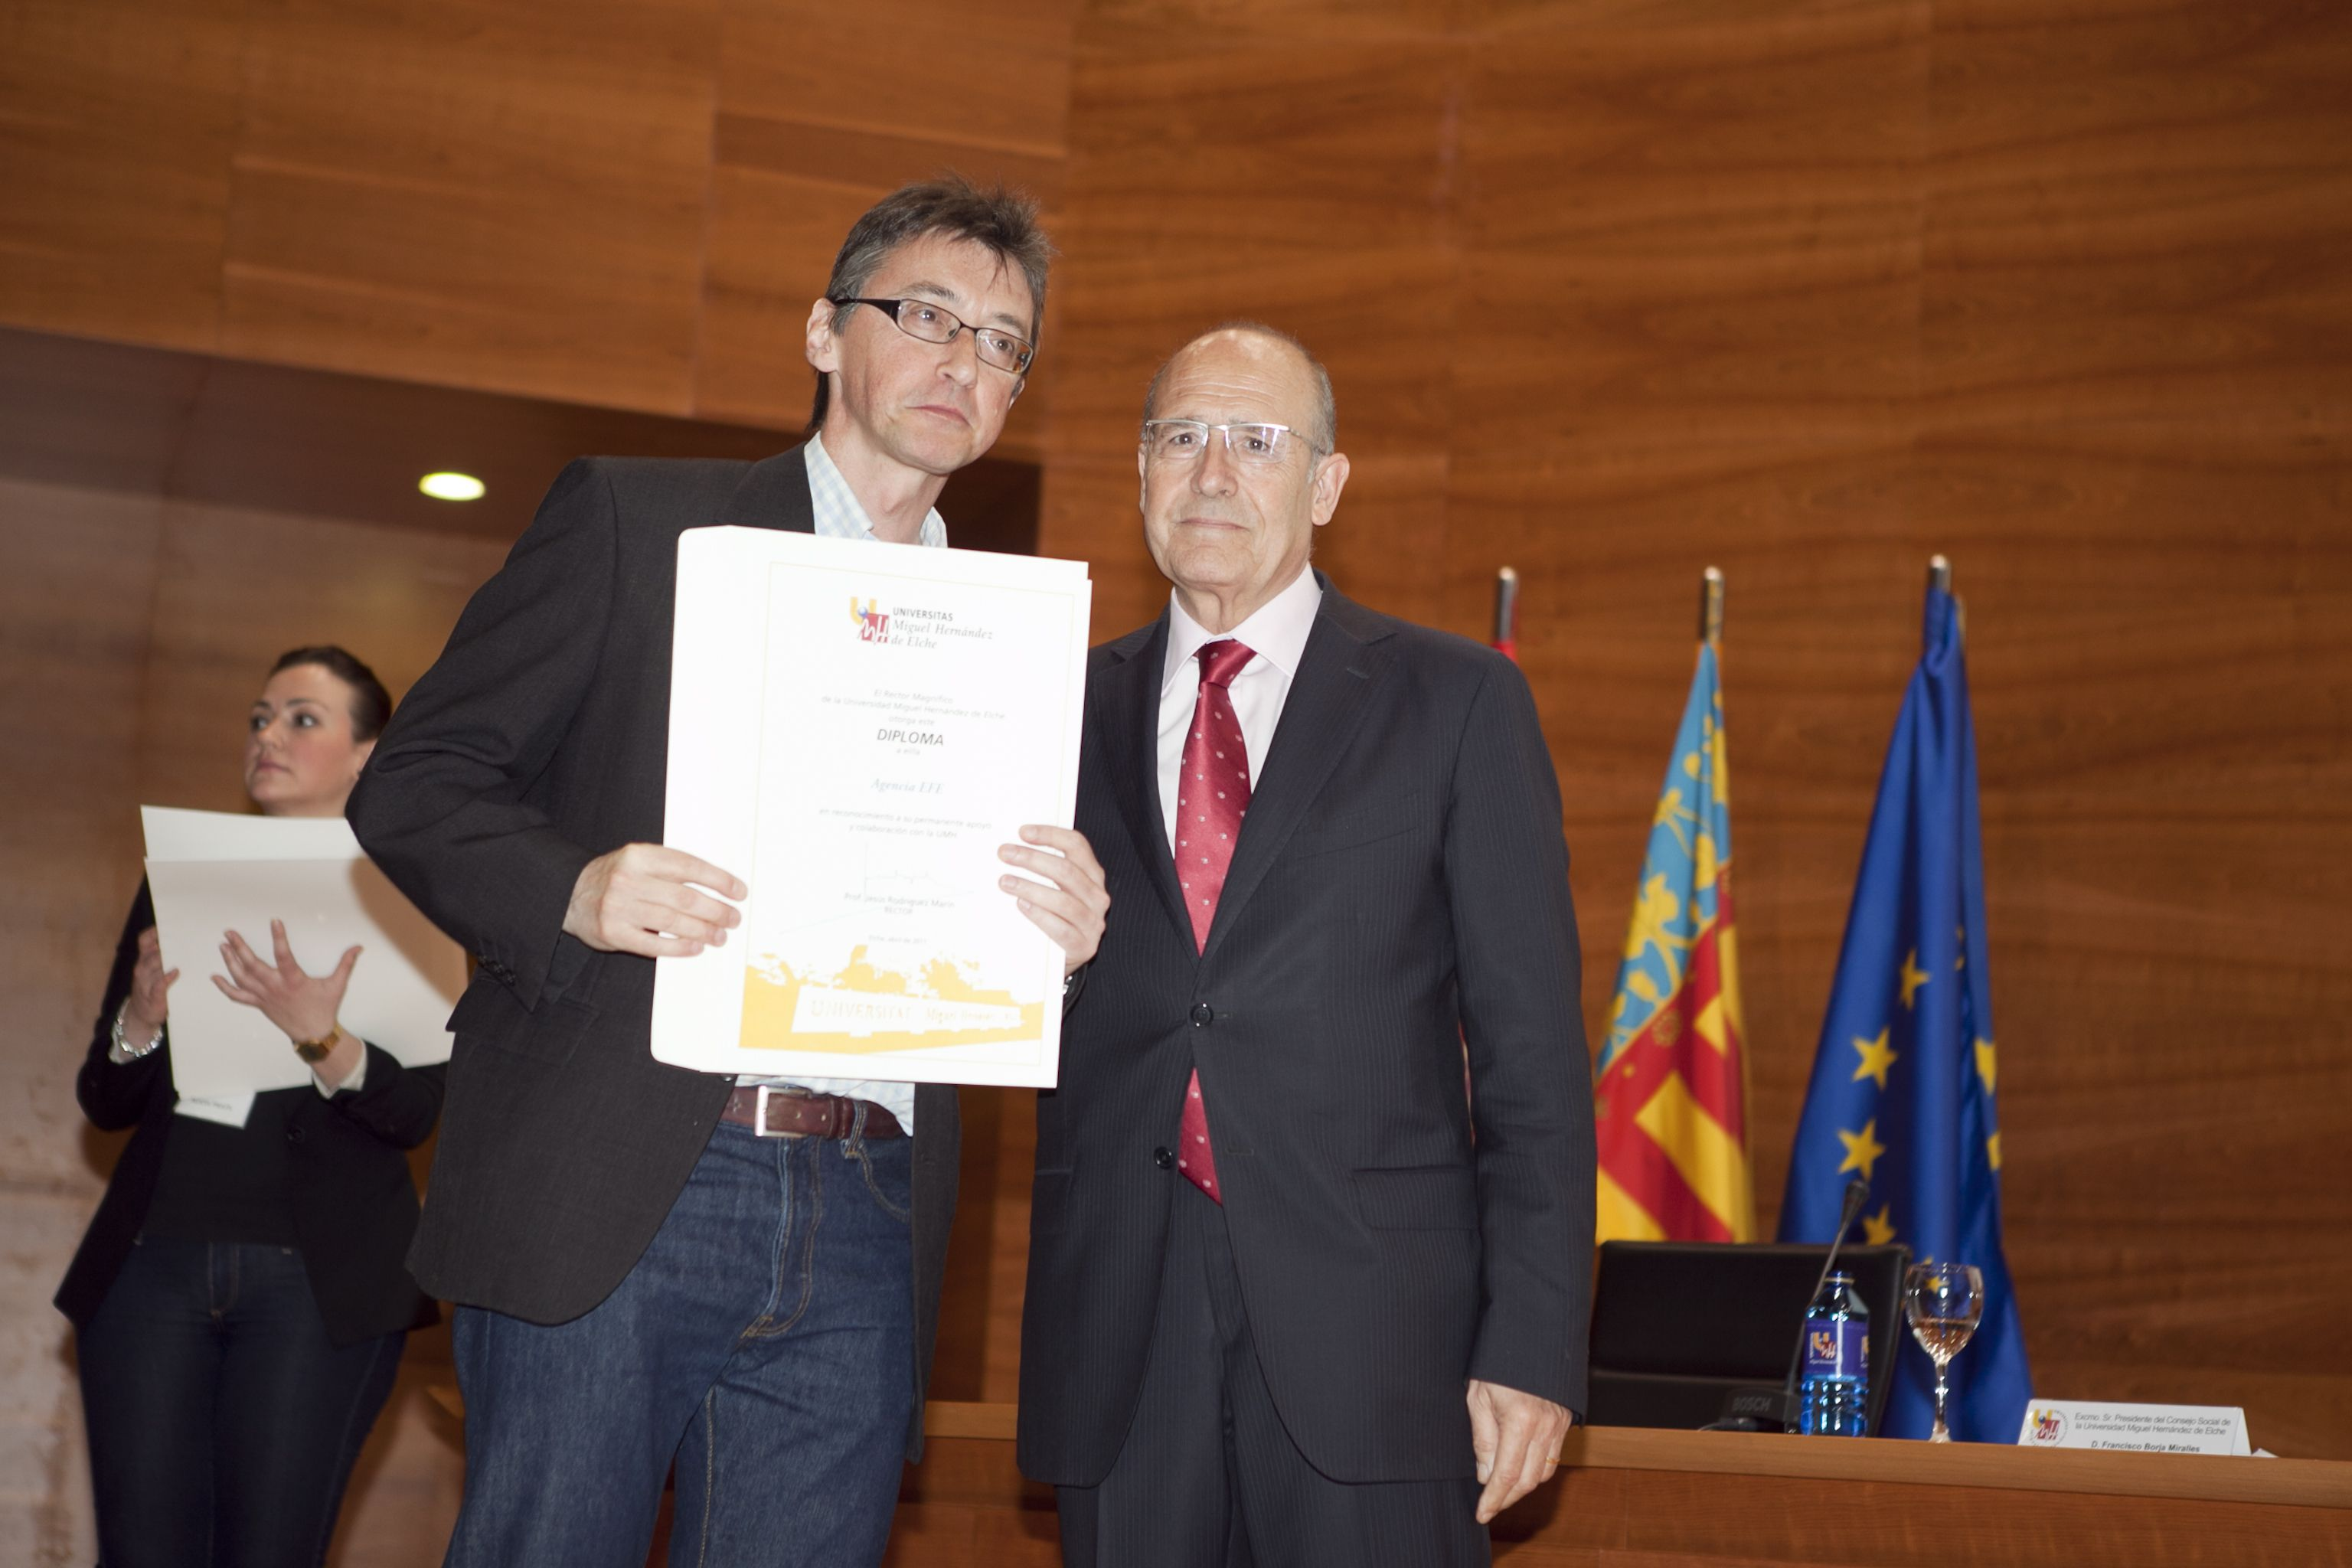 umh-diplomas-rector_mg_6842.jpg